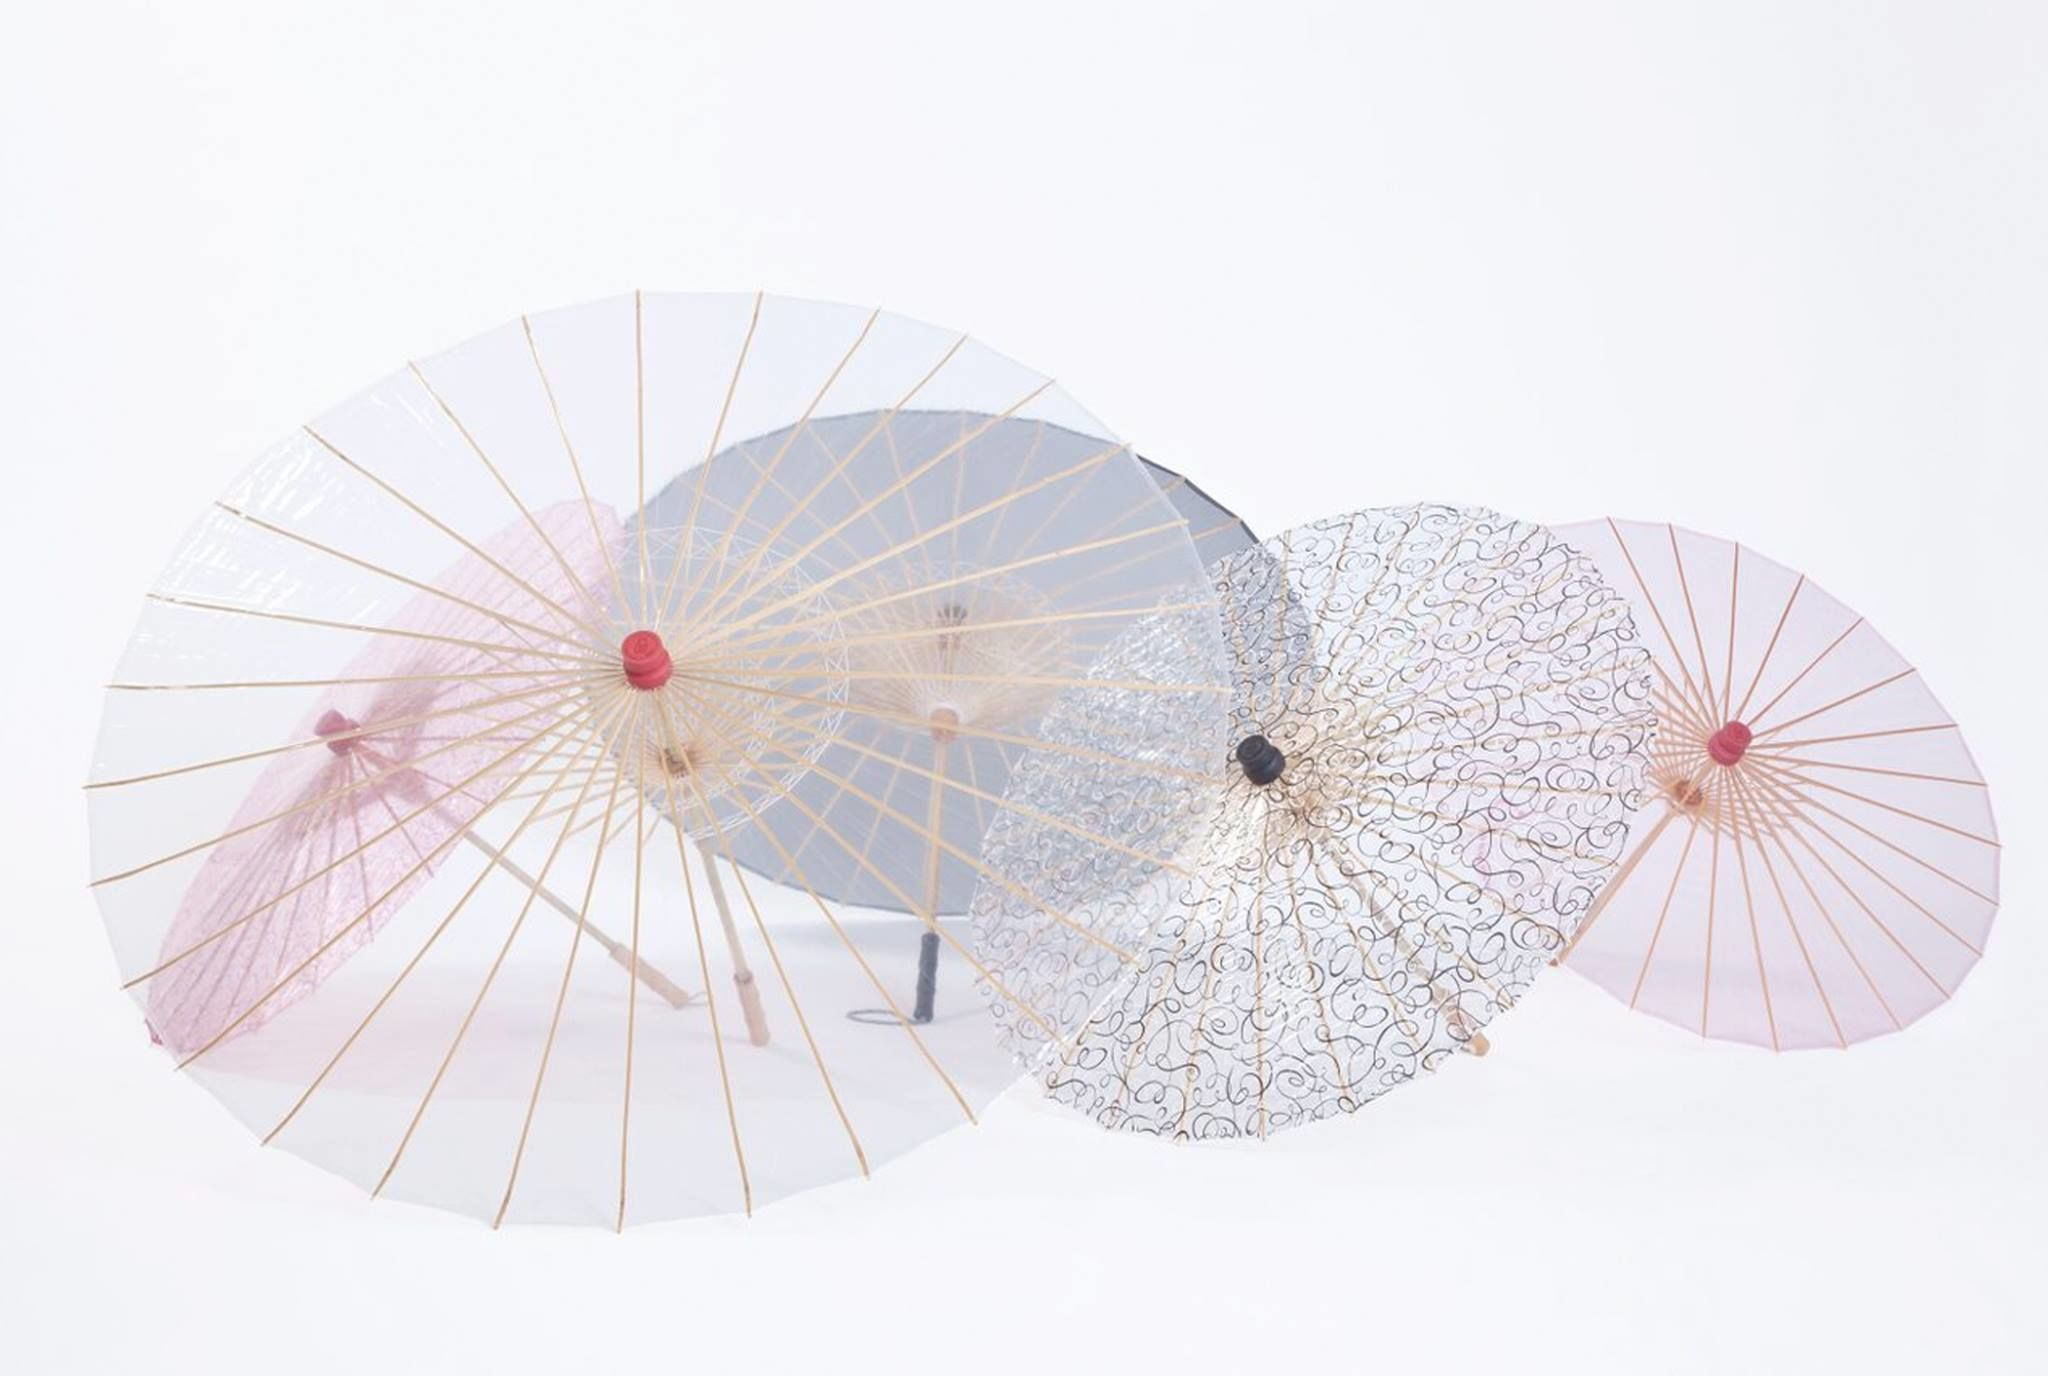 UVを99%カット!100%自然に還る「エコな番傘」が海外でブーム